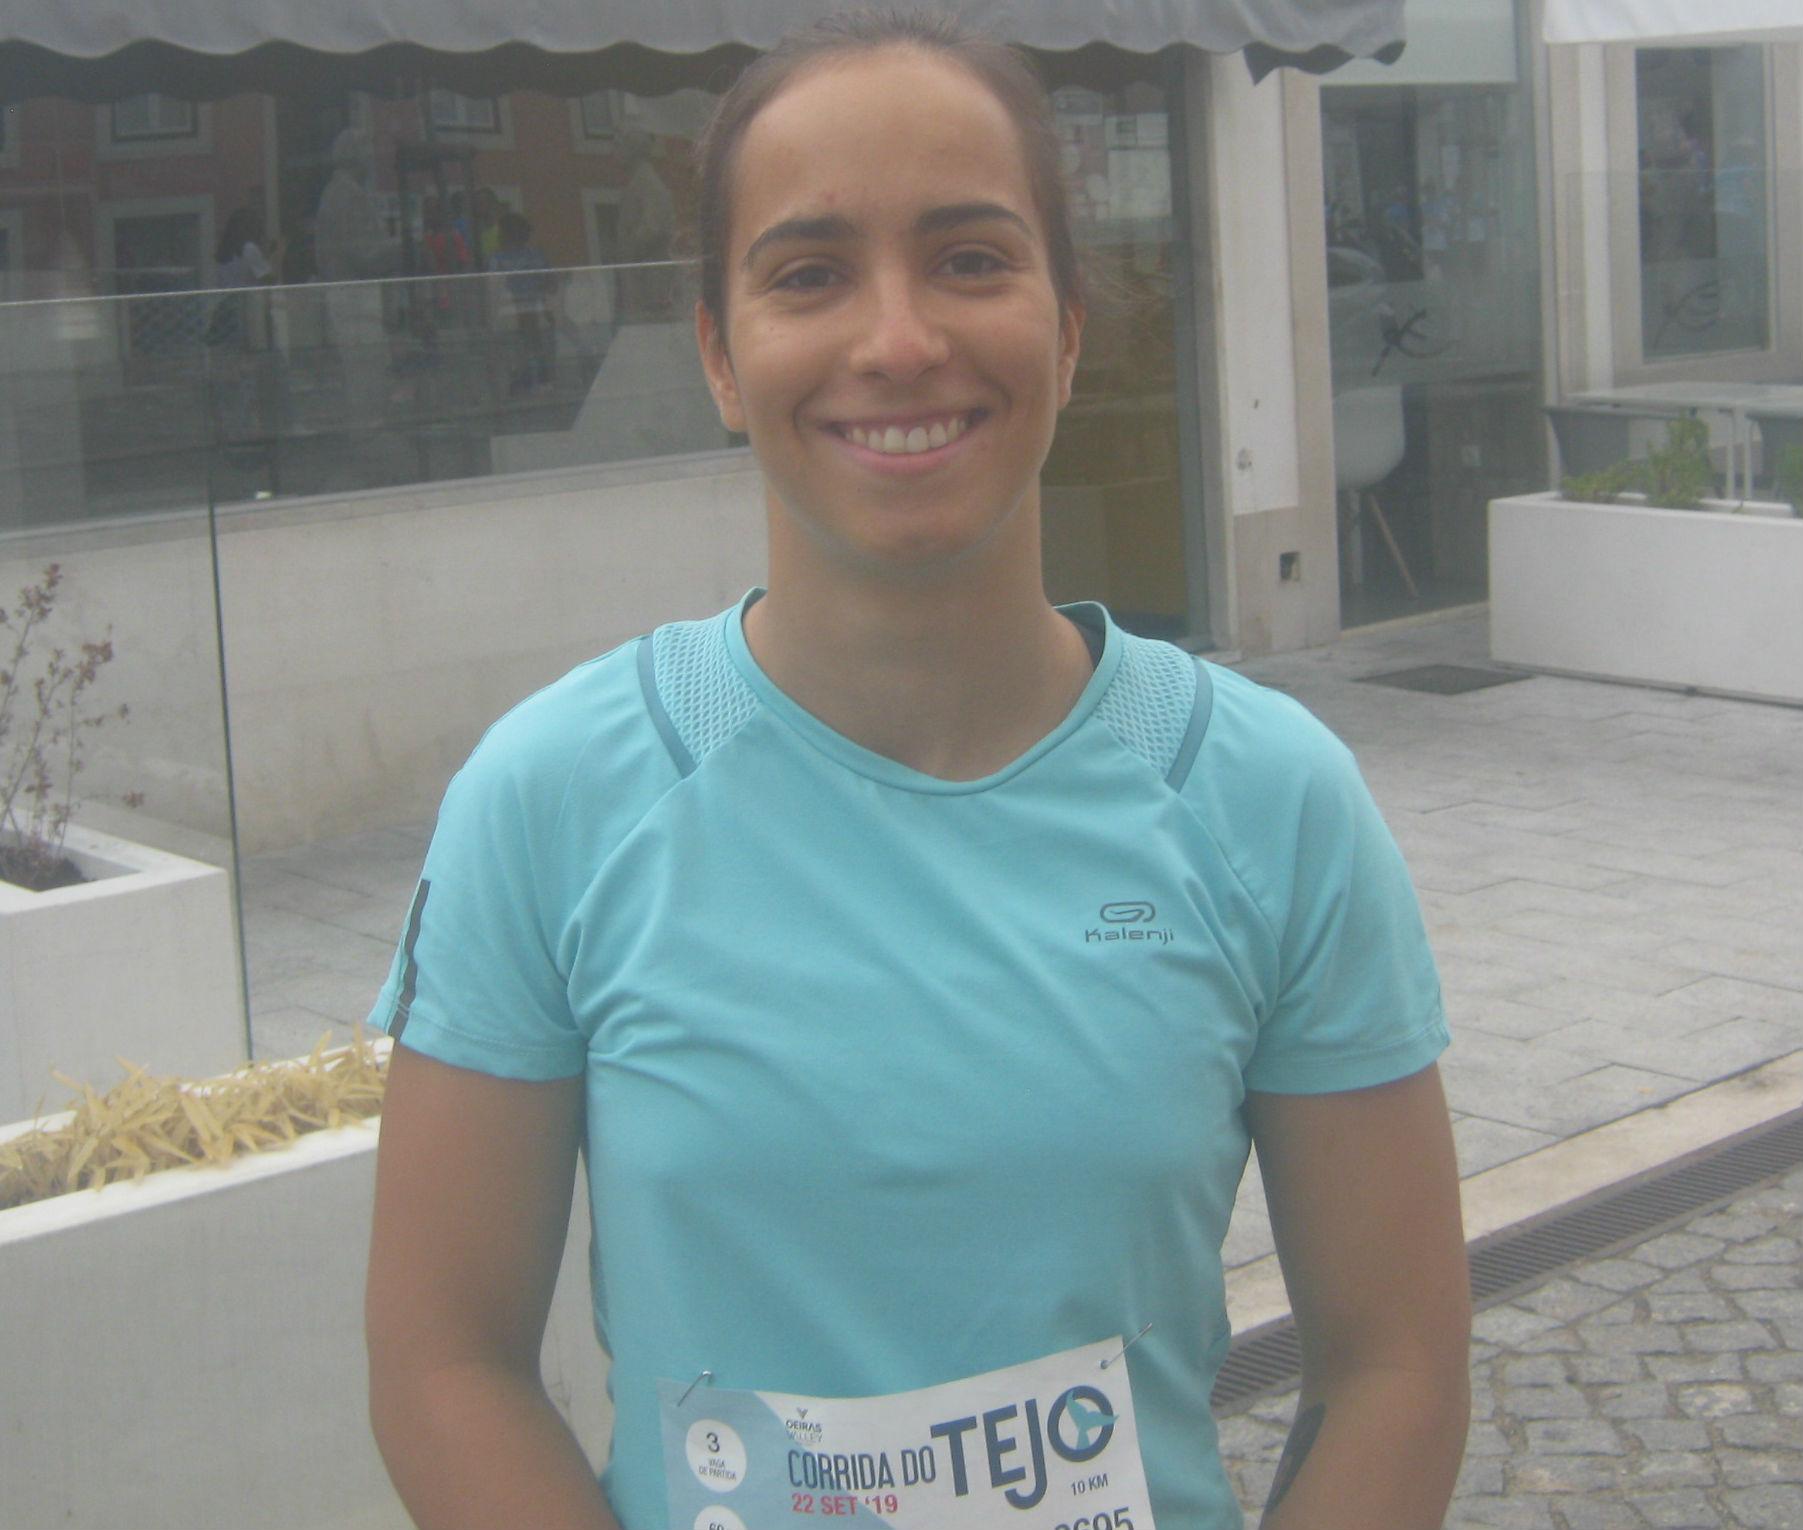 Corrida do Tejo 2019-Catarina Oliveira